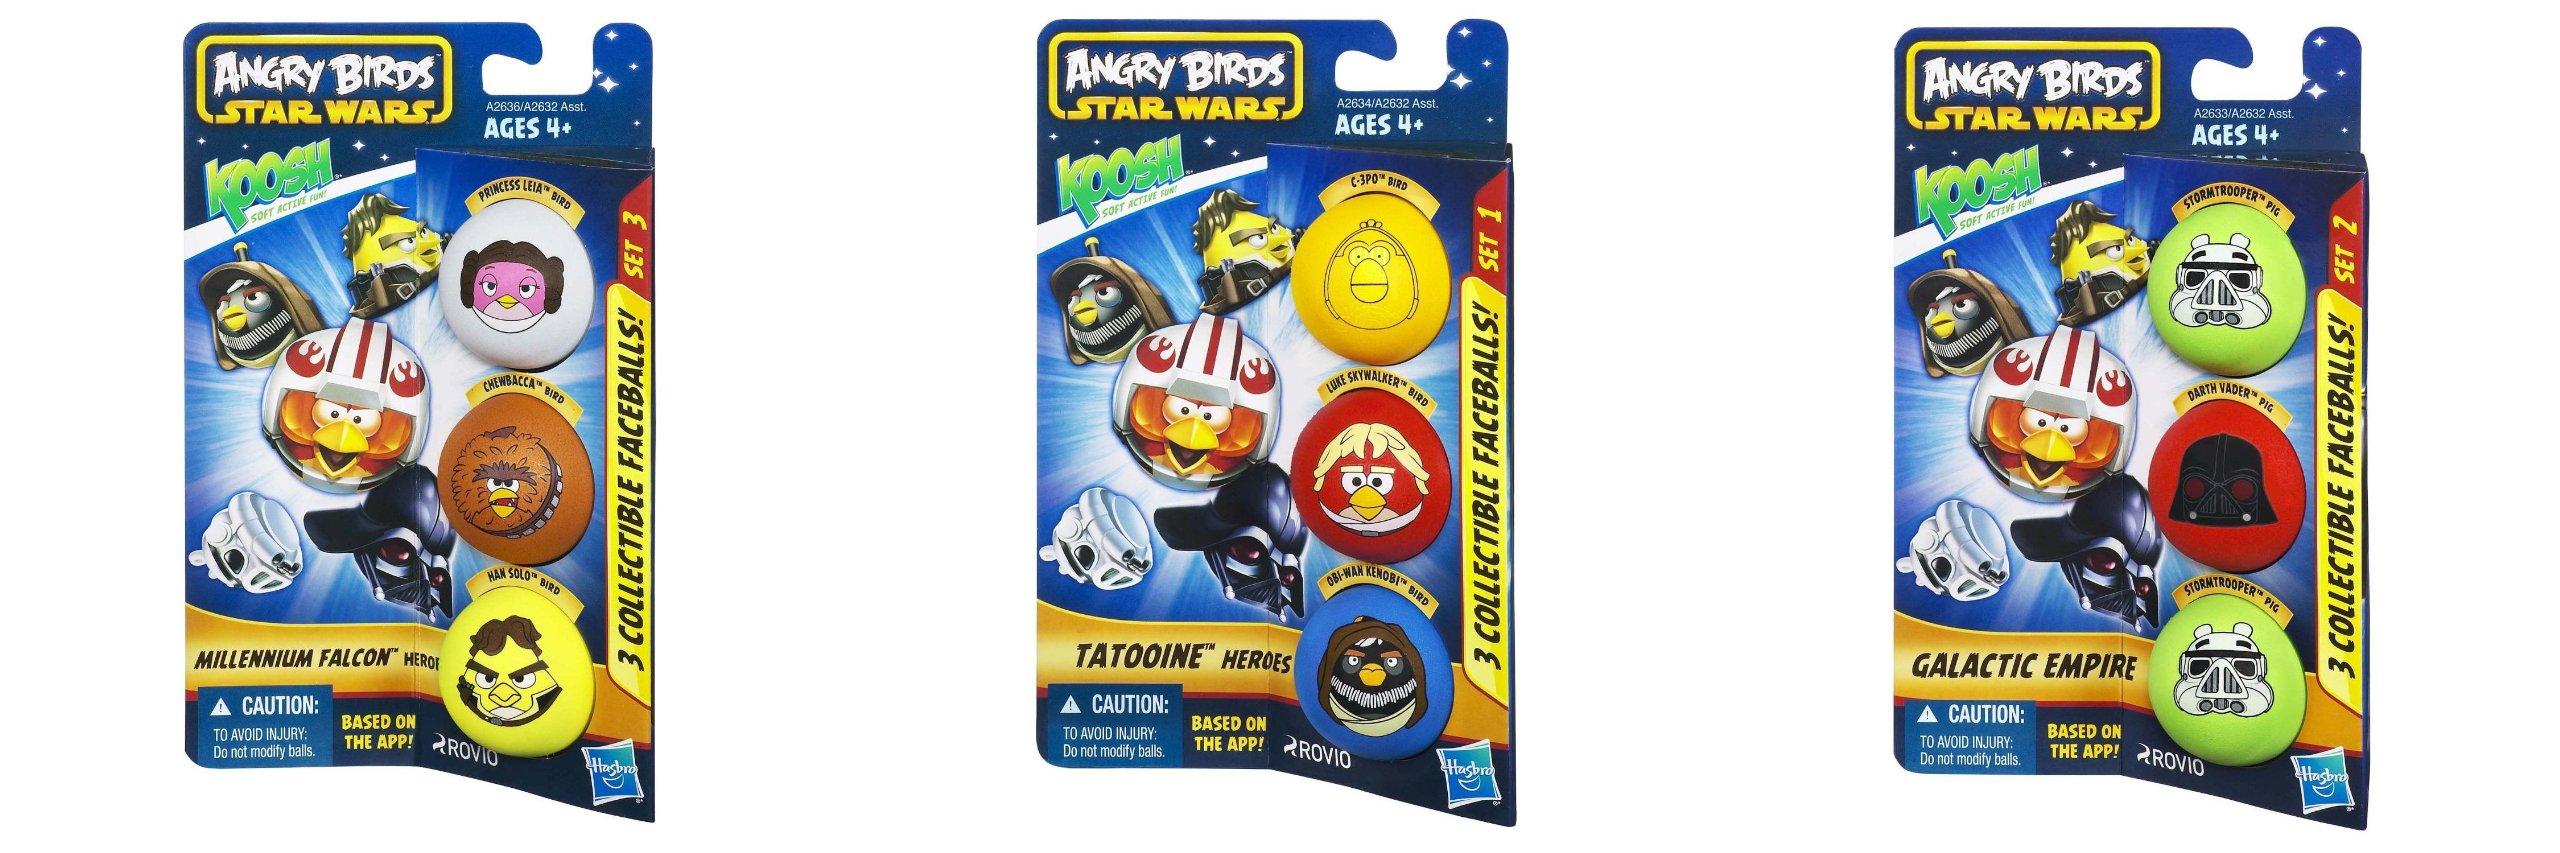 Star Wars Angry Birds Koosh Set of 9 Star Wars Character Balls Hasbro